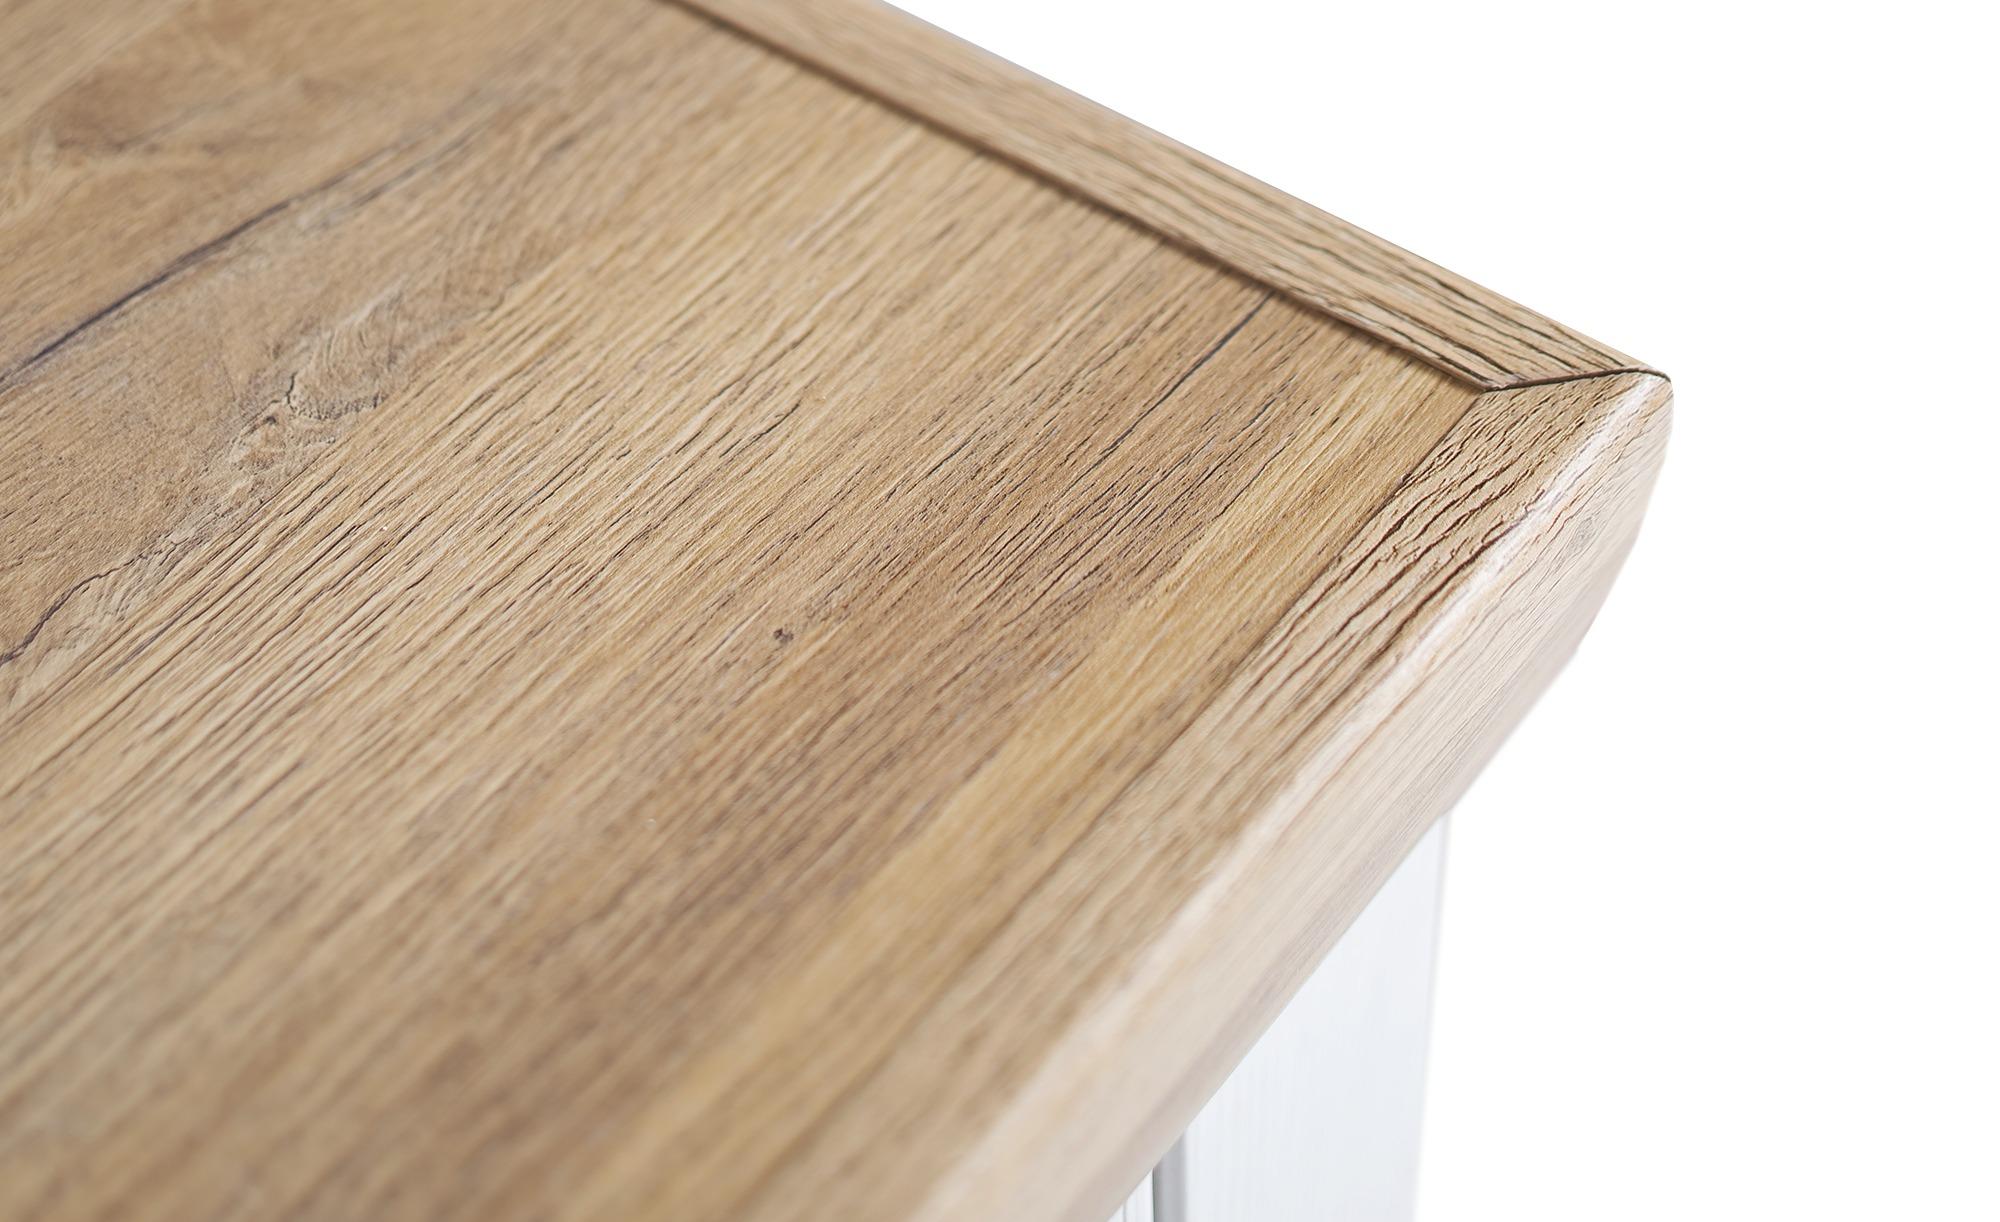 Highboard - R  Xanten ¦ weiß ¦ Maße (cm): B: 118 H: 142 T: 40 Kommoden & Sideboards > Highboards - Höffner